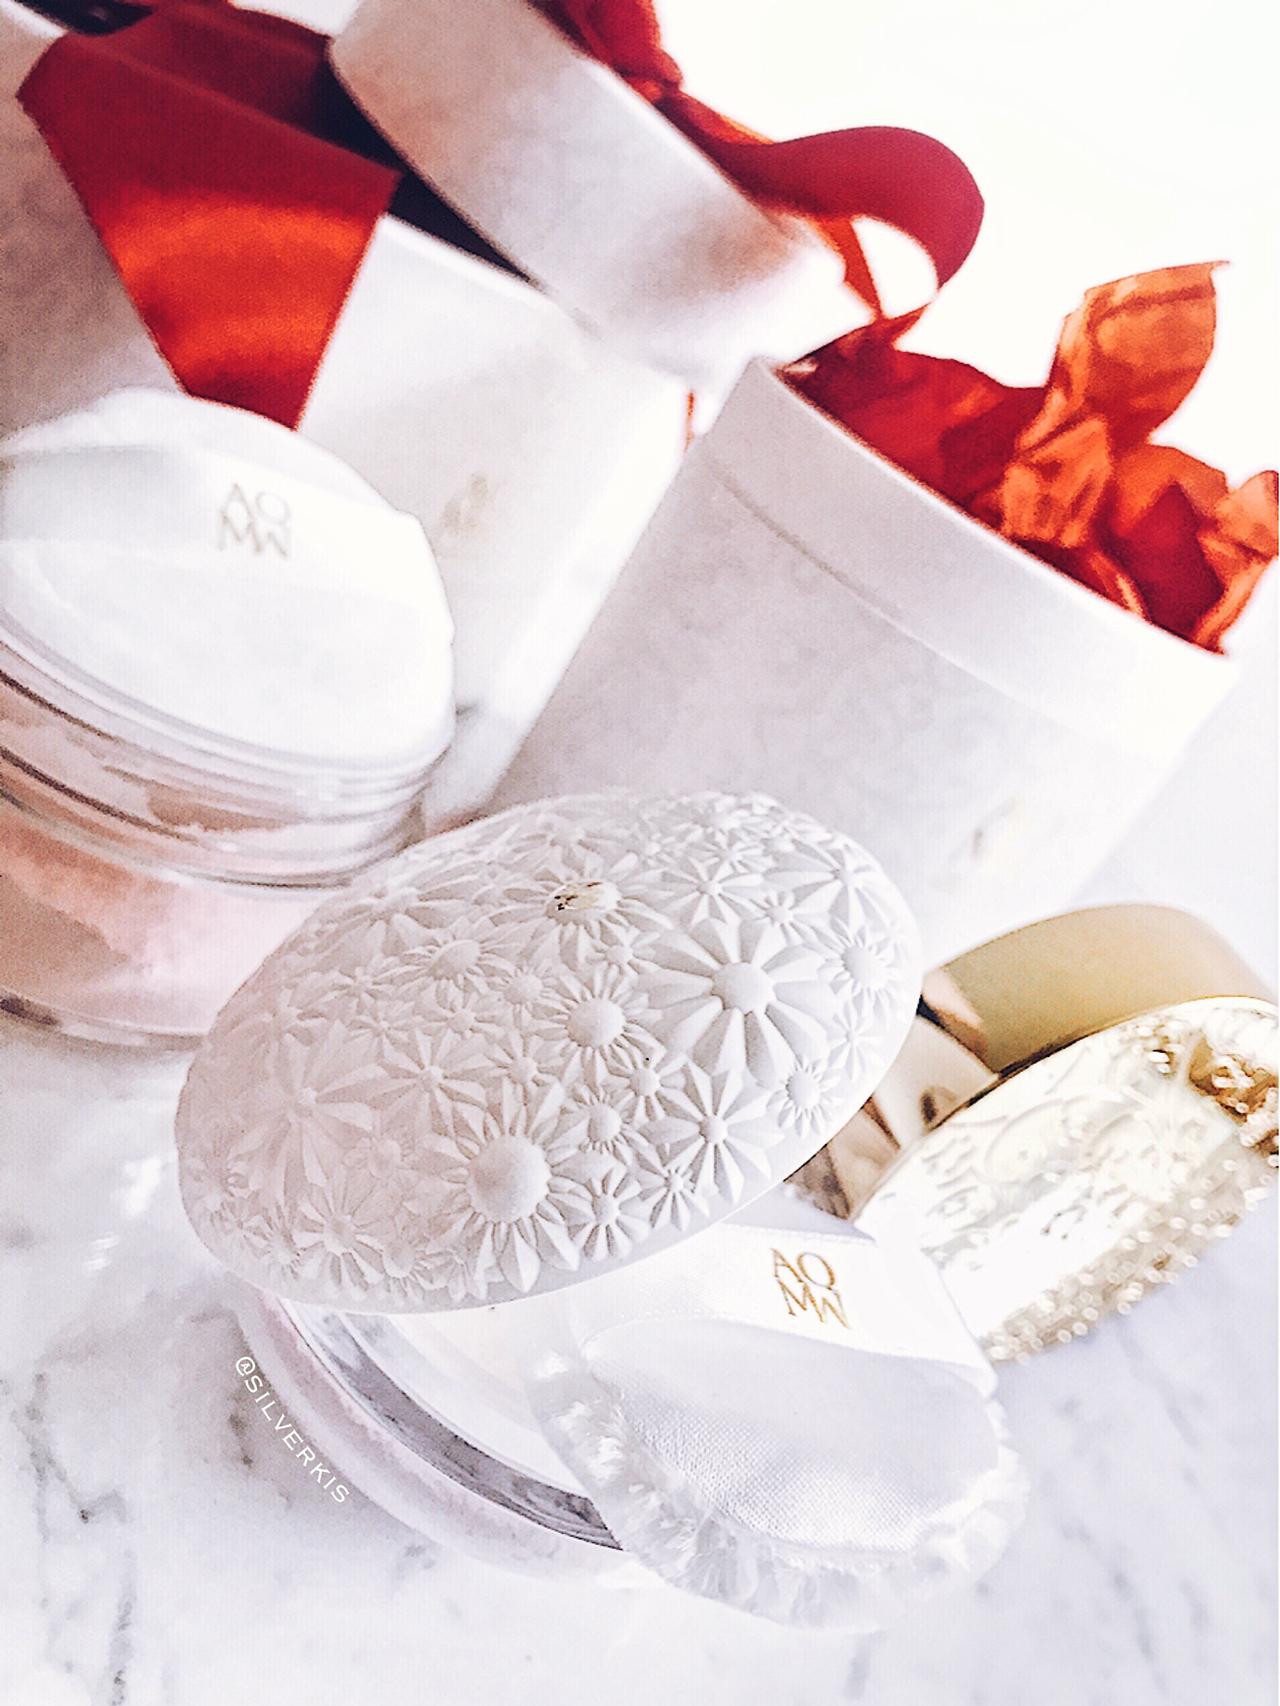 Cosme Decorte Eternal Bouquet coffret for Holiday 2017